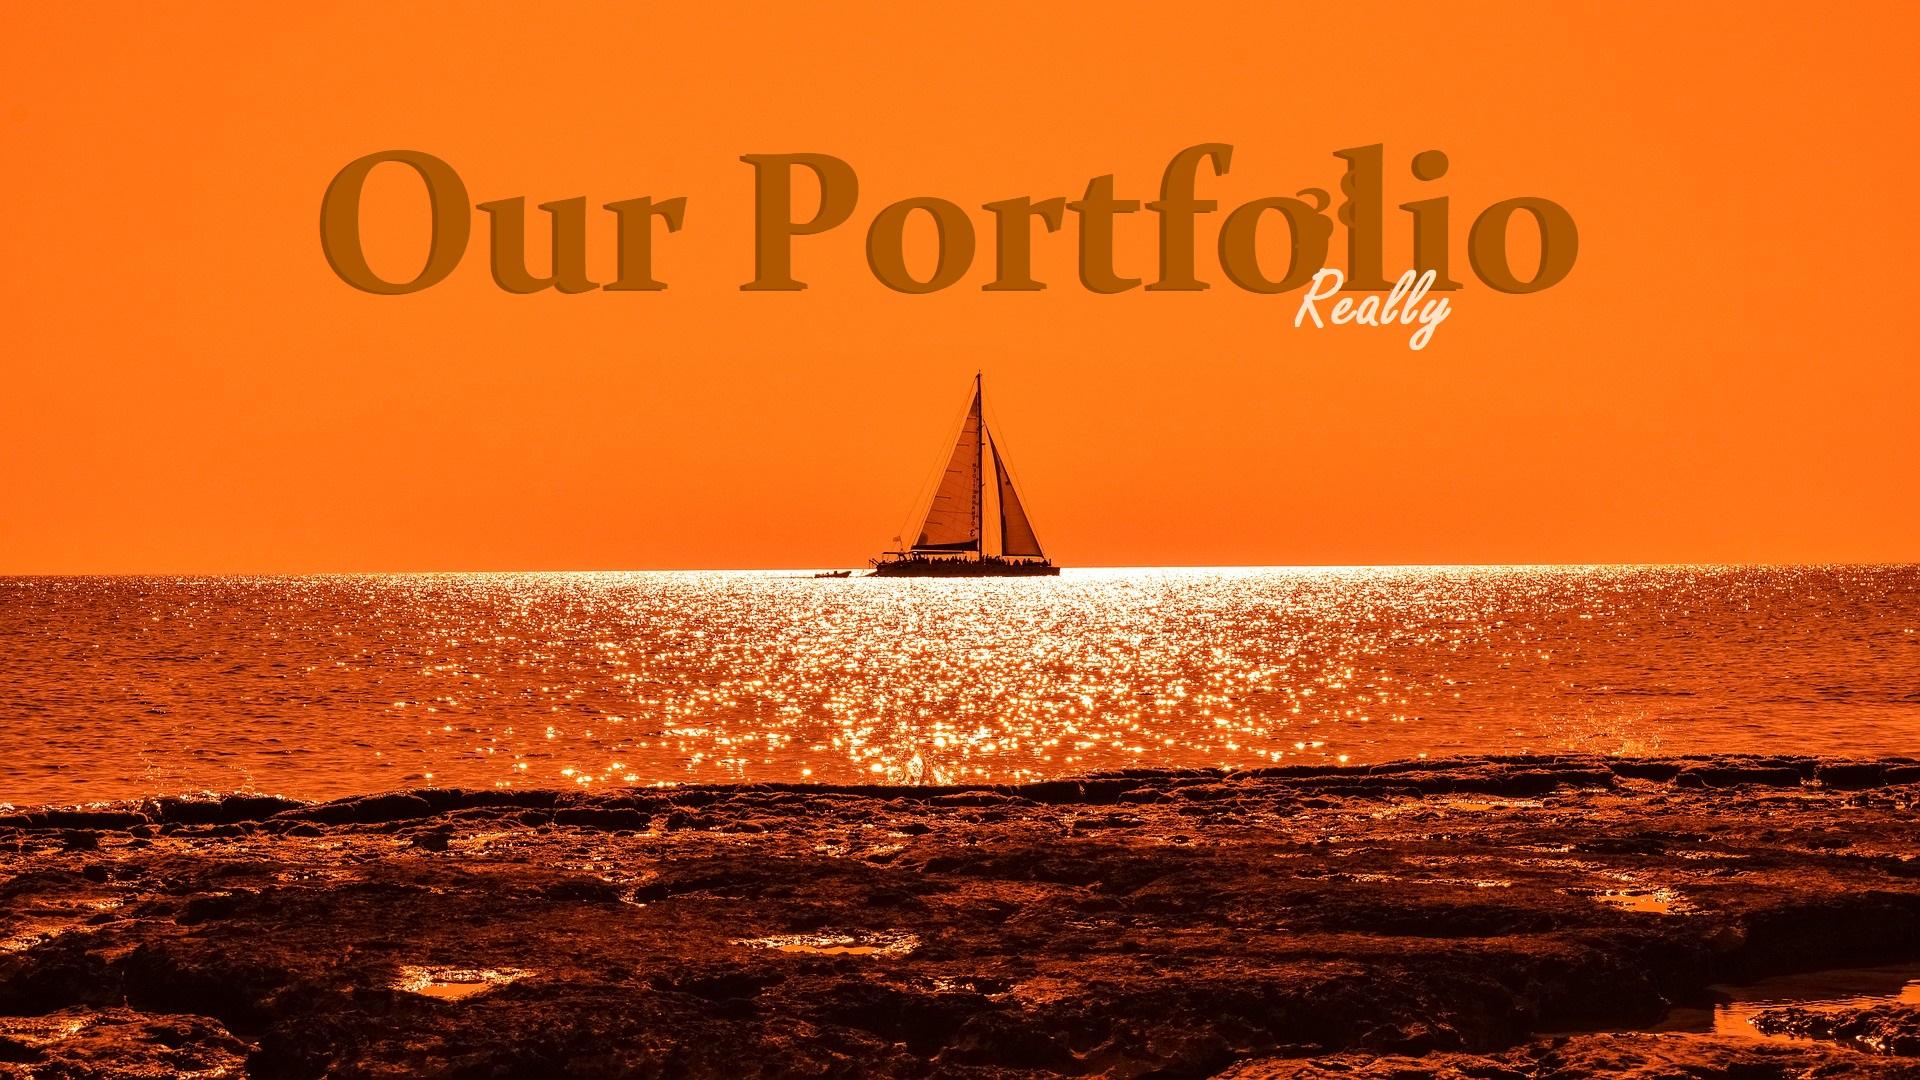 Our Portfolio 3